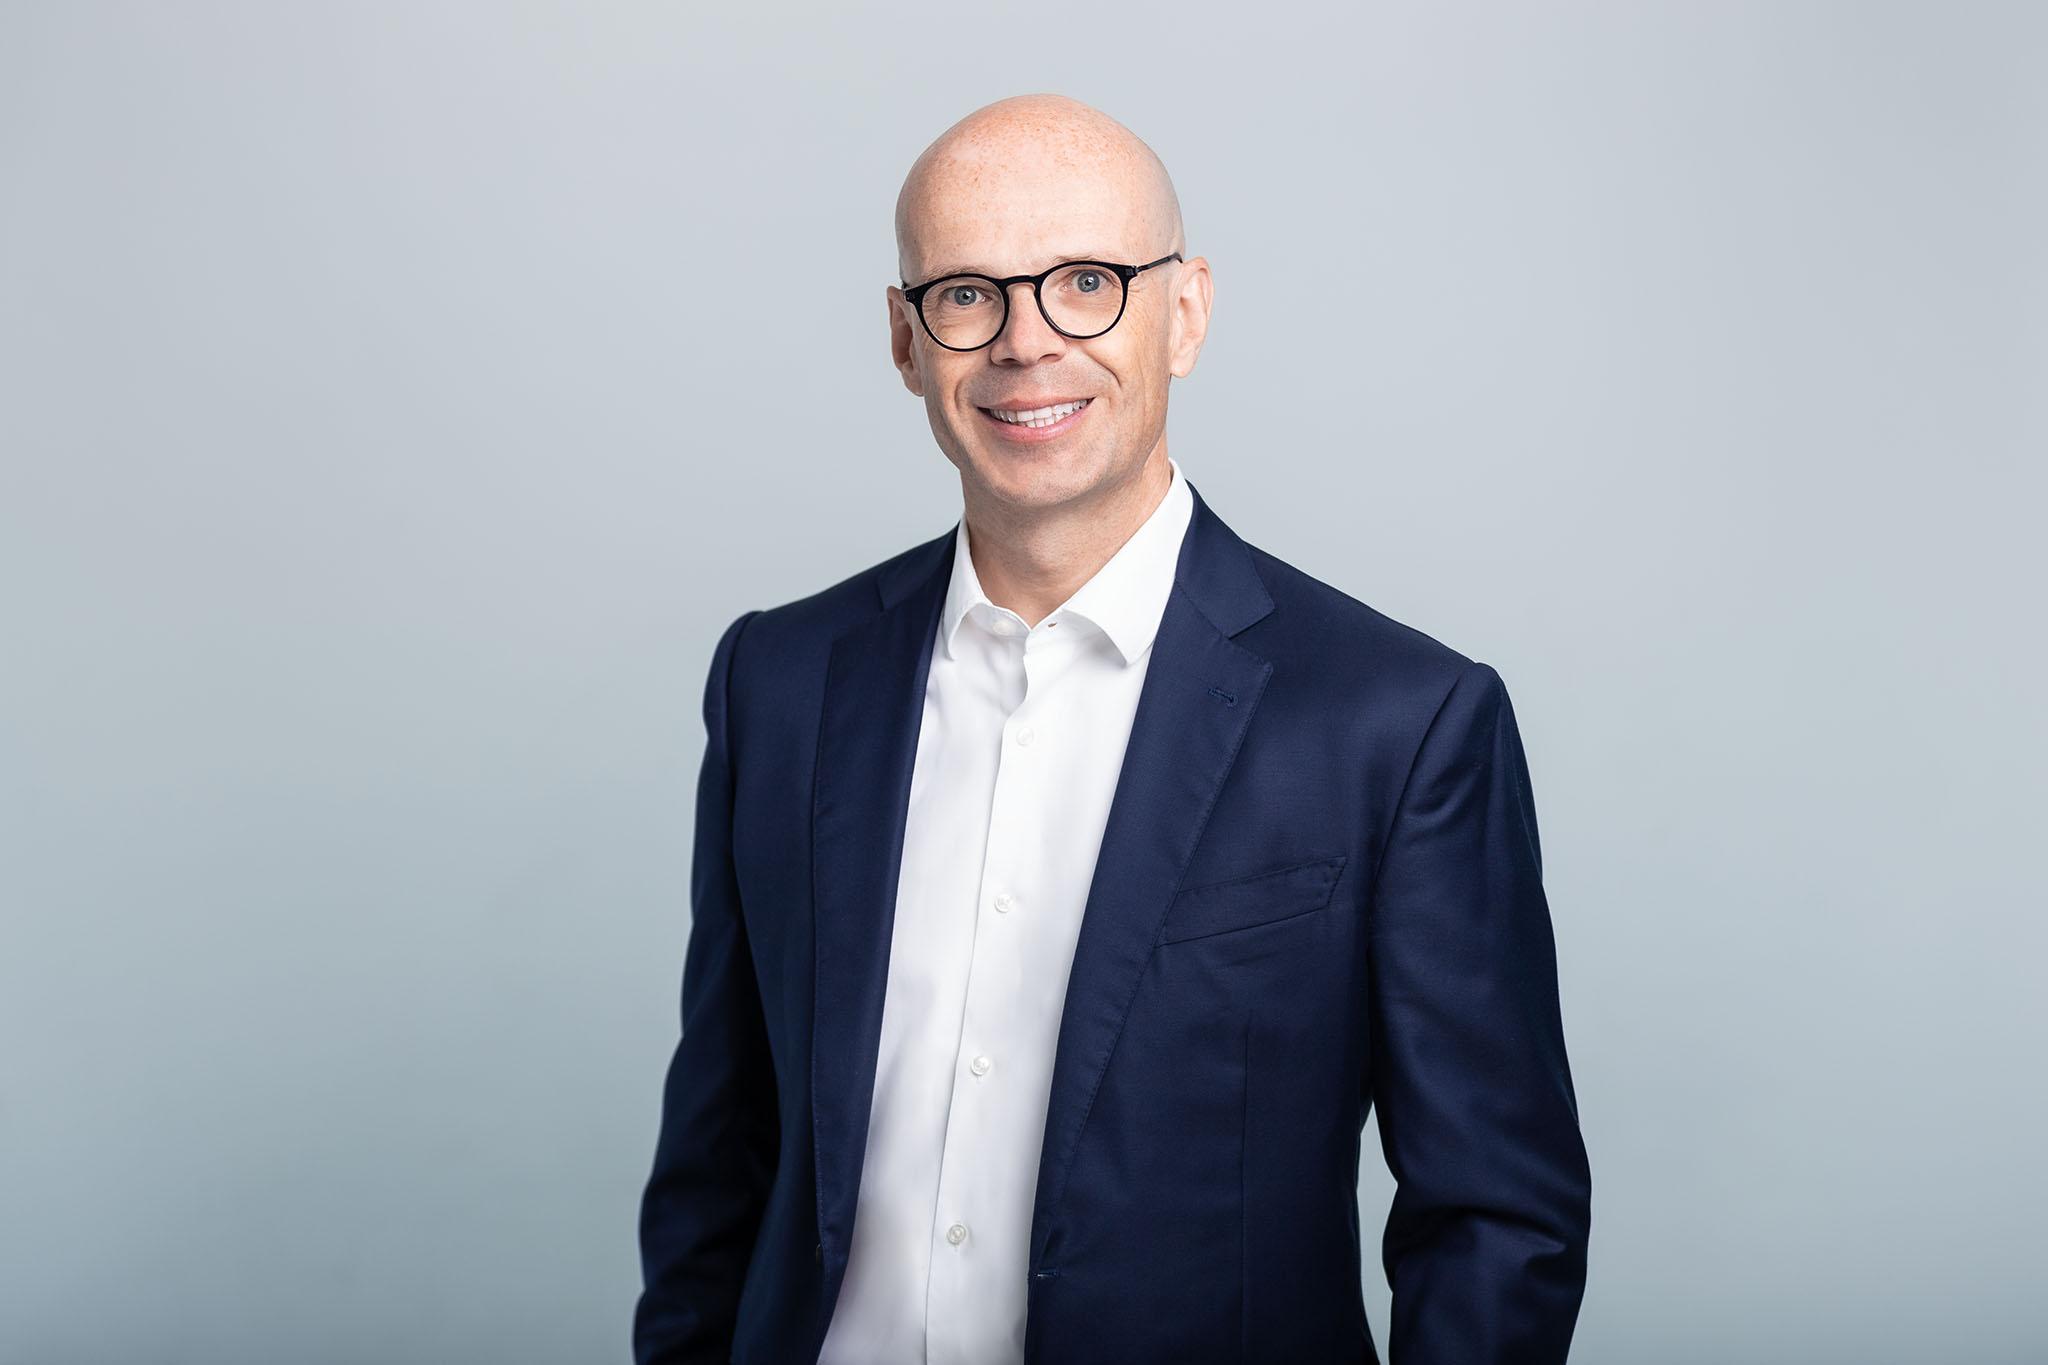 Prof. Dr. Franziskus Knoll